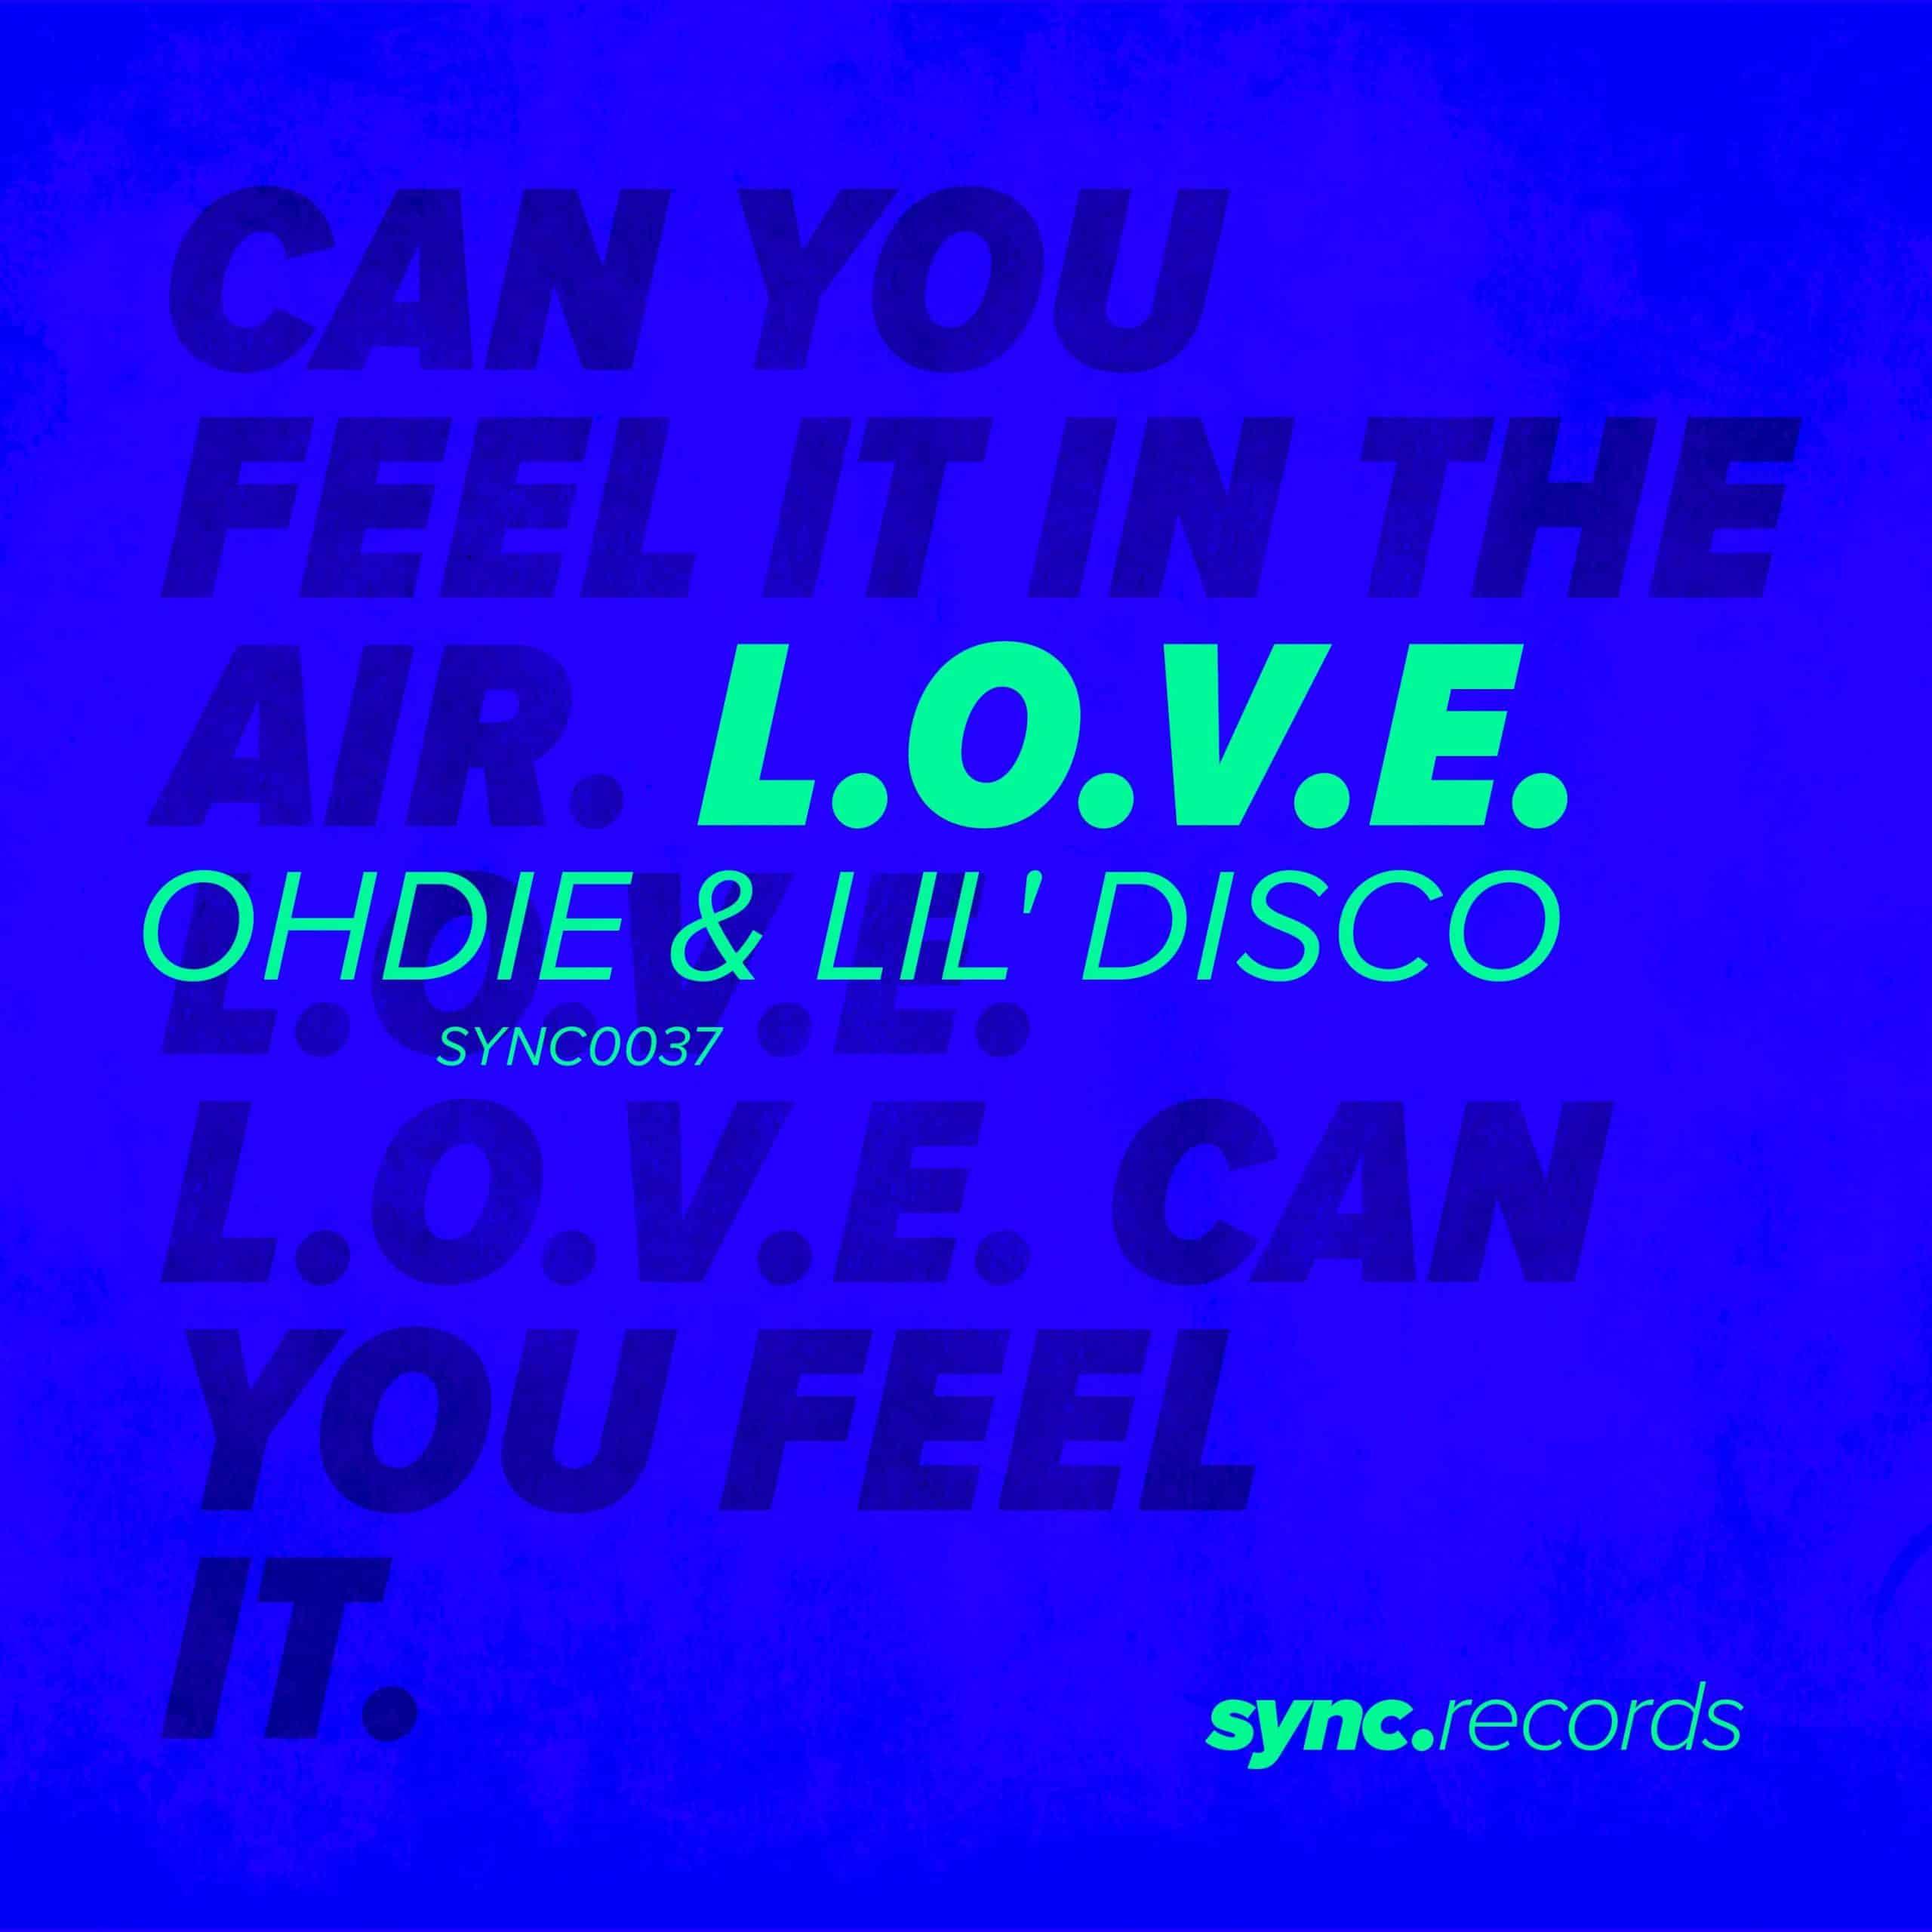 Ohdie & Lil' Disco - L.O.V.E. (Cover)